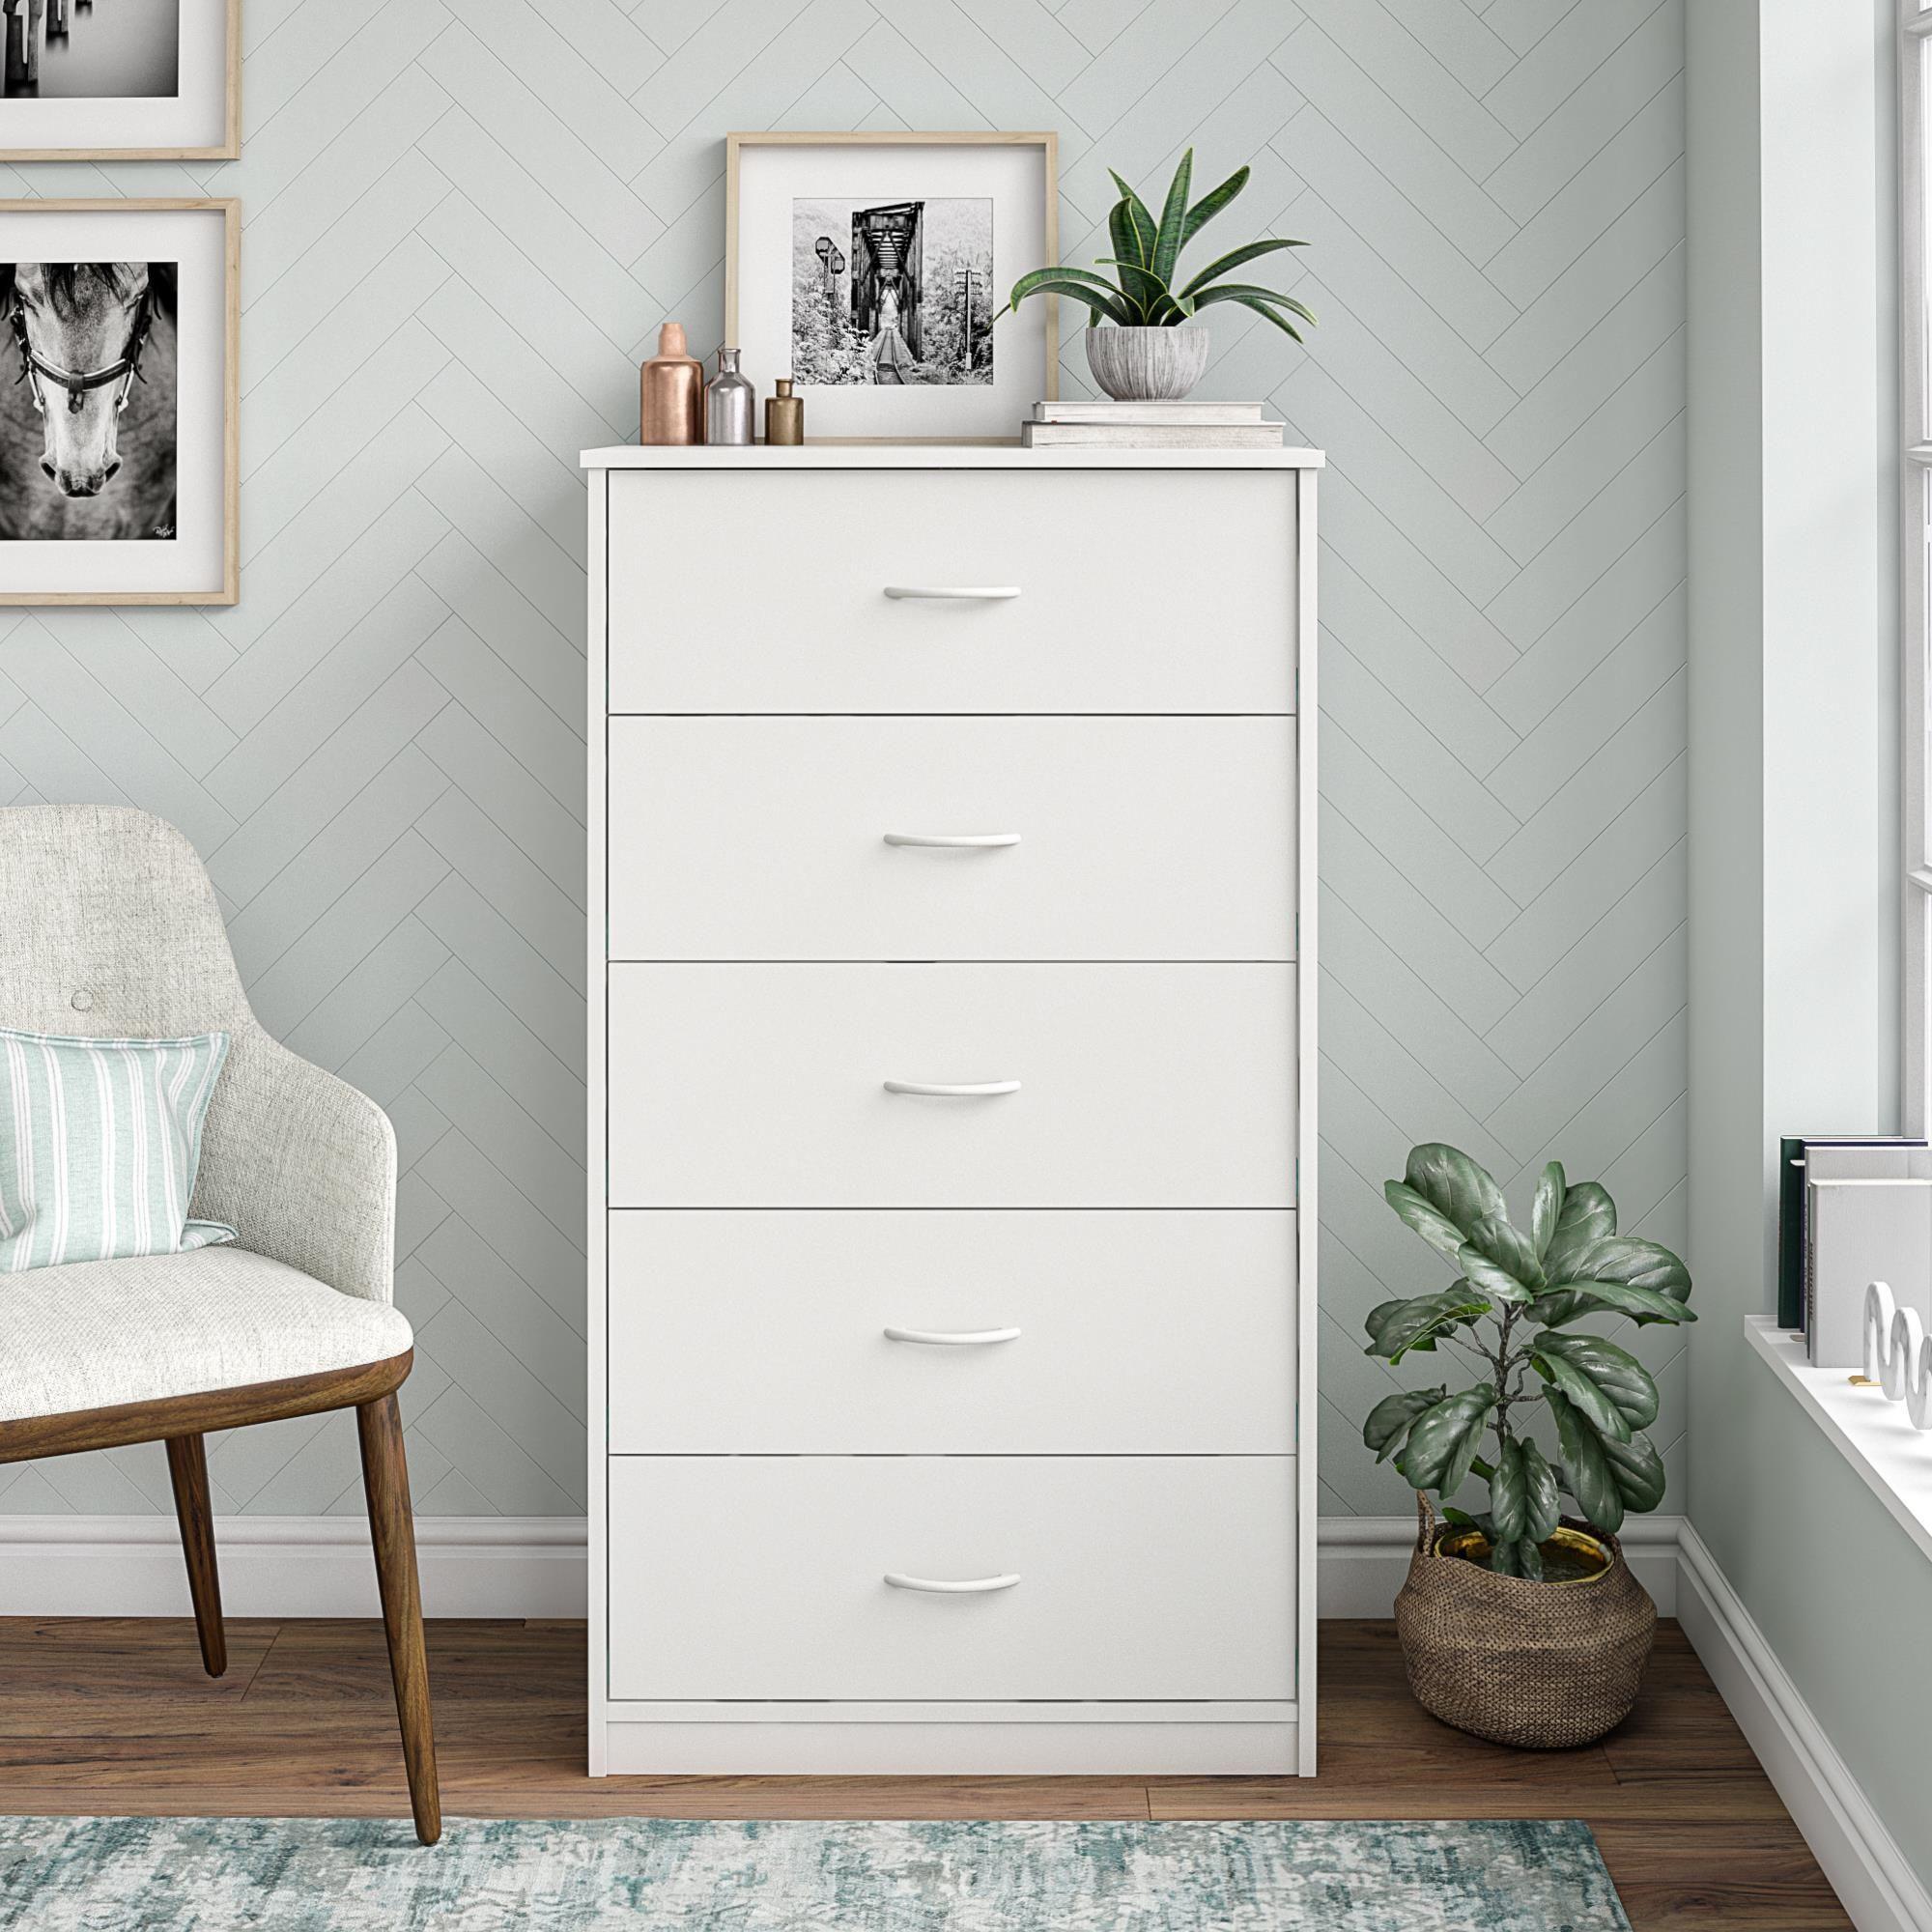 Mainstays Classic 5 Drawer Dresser White Finish Walmart Com Dresser Decor Bedroom White Dresser Decor Room Ideas Bedroom [ 2000 x 2000 Pixel ]